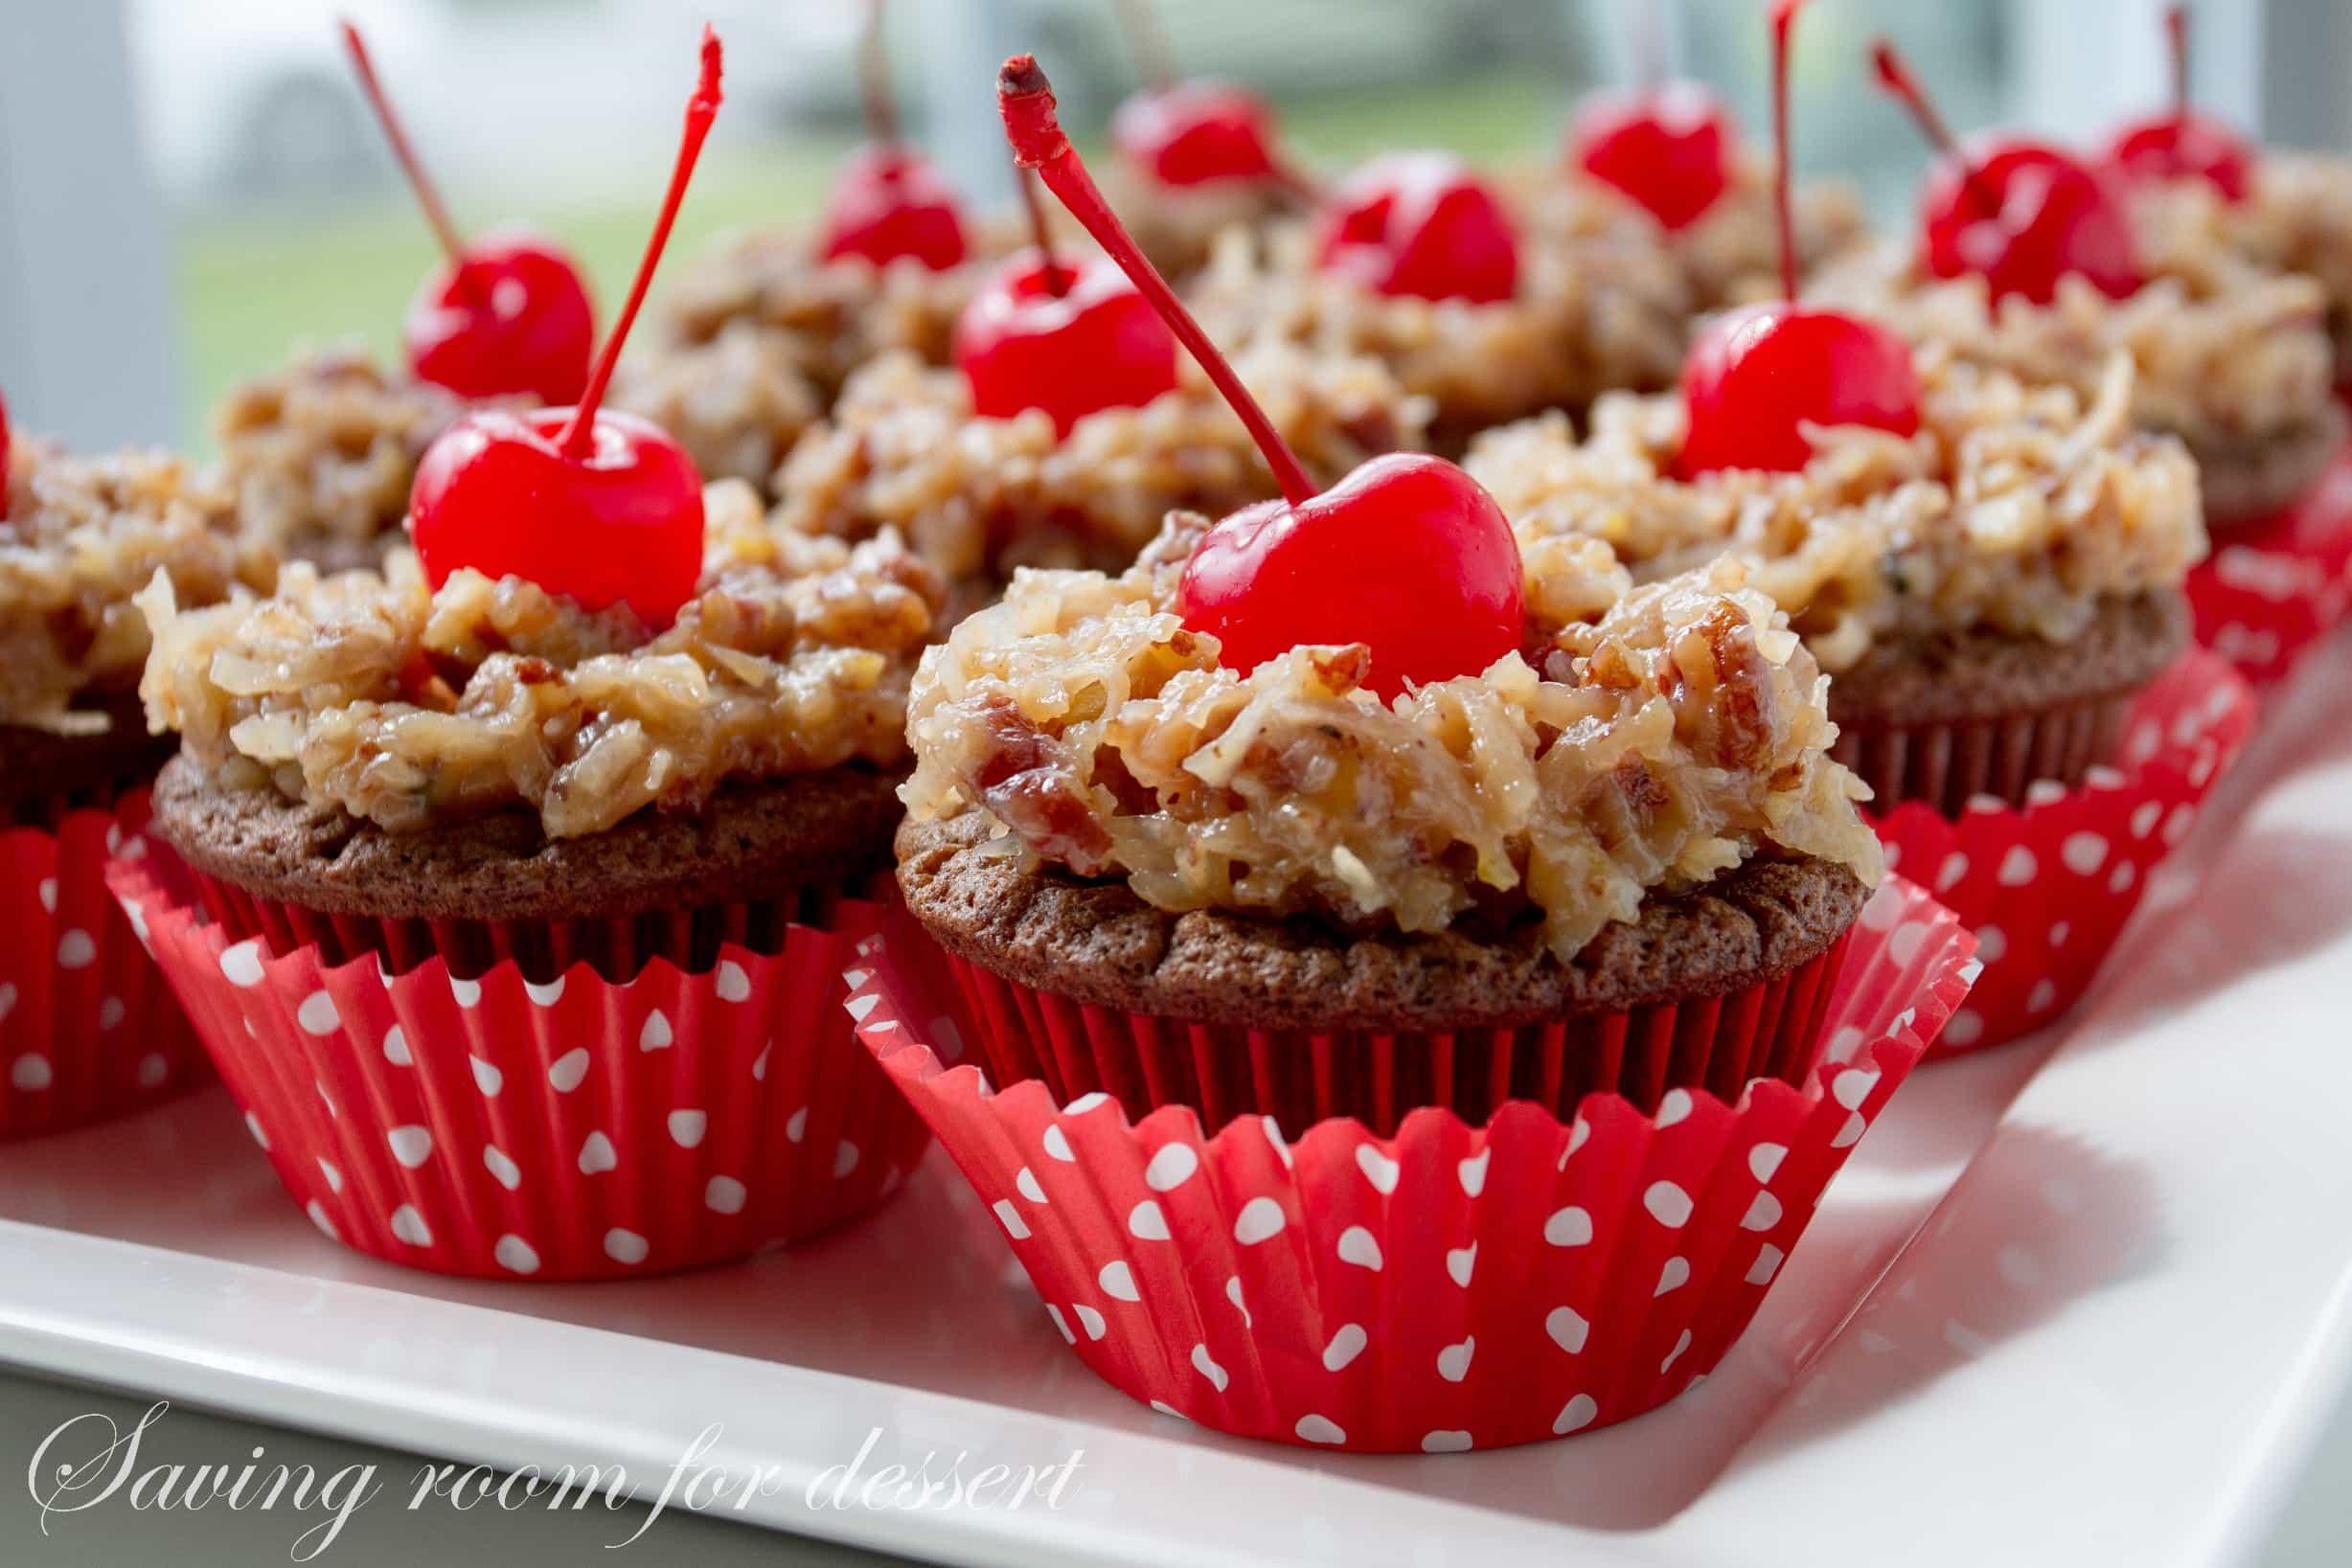 German Chocolate Cupcakes - Saving Room for Dessert